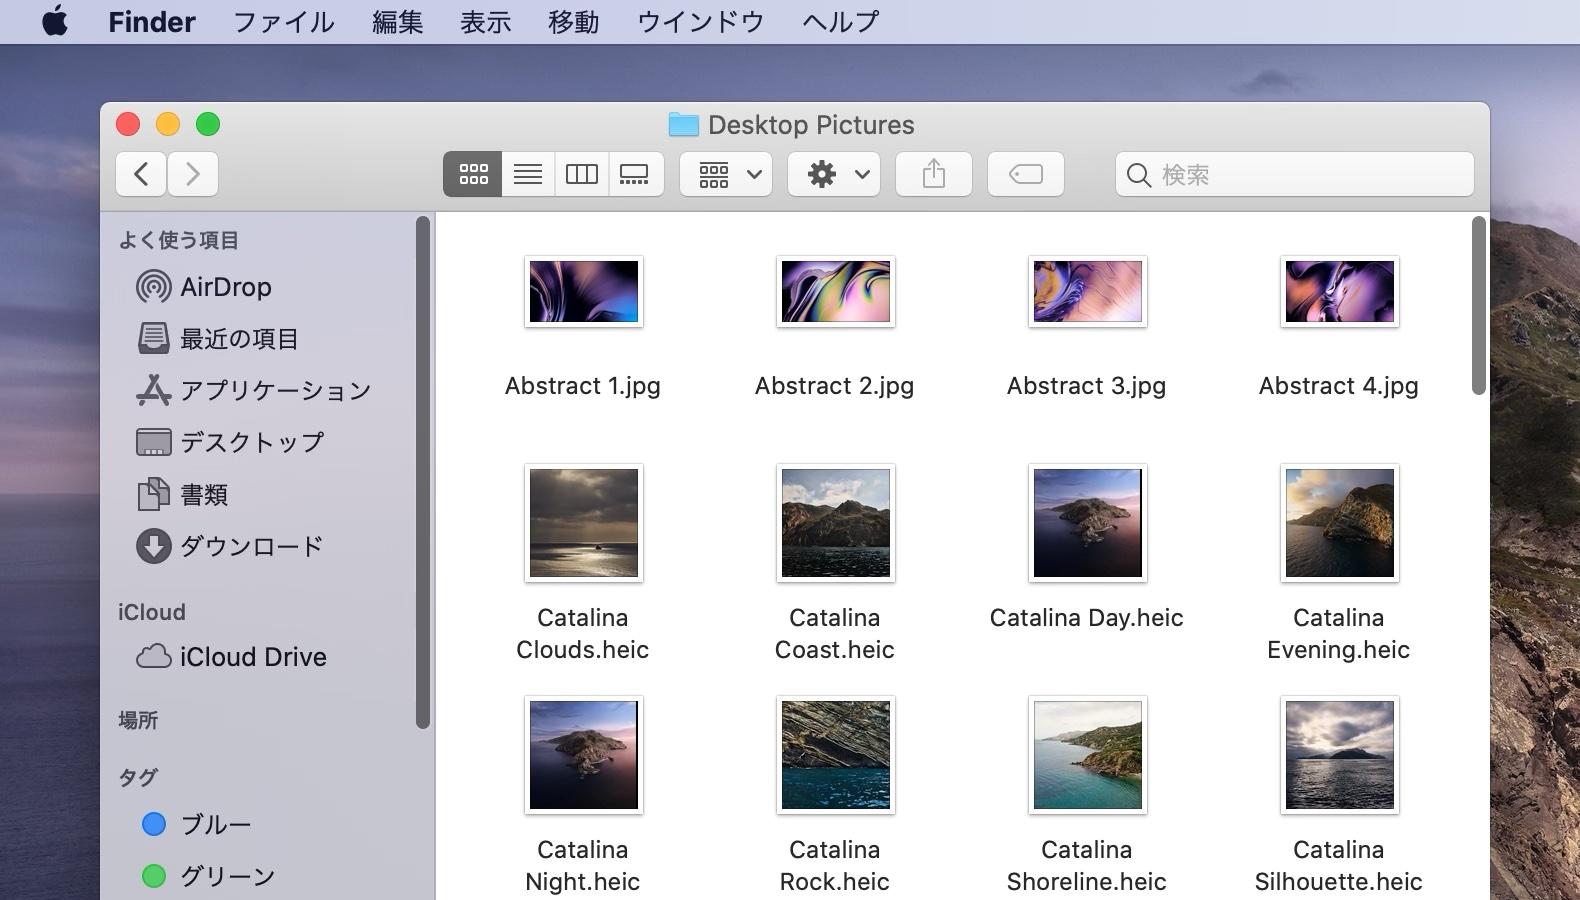 macOS 10.15 CatalinaのFinder